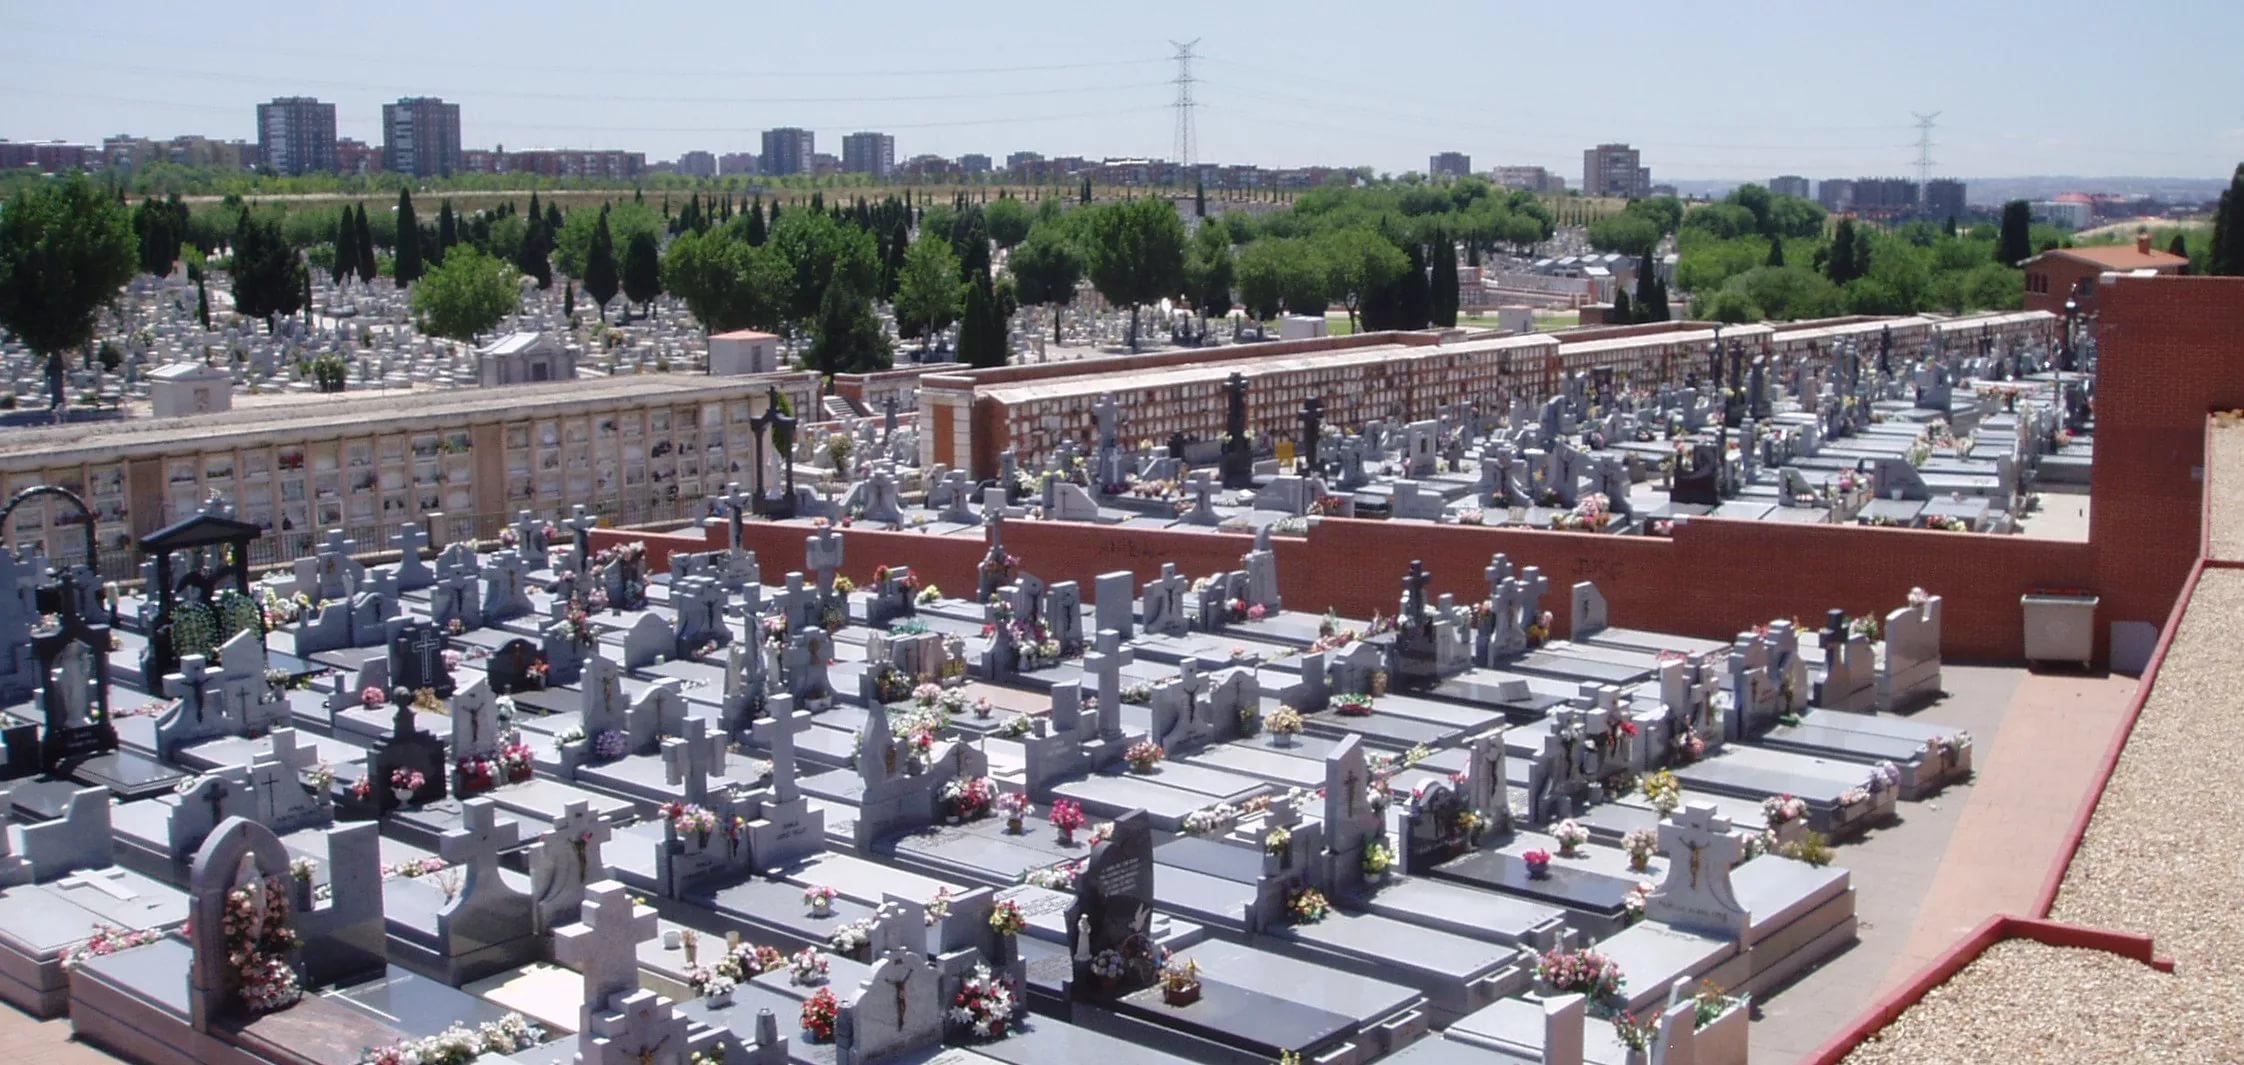 Испания. Кладбище Альмудена